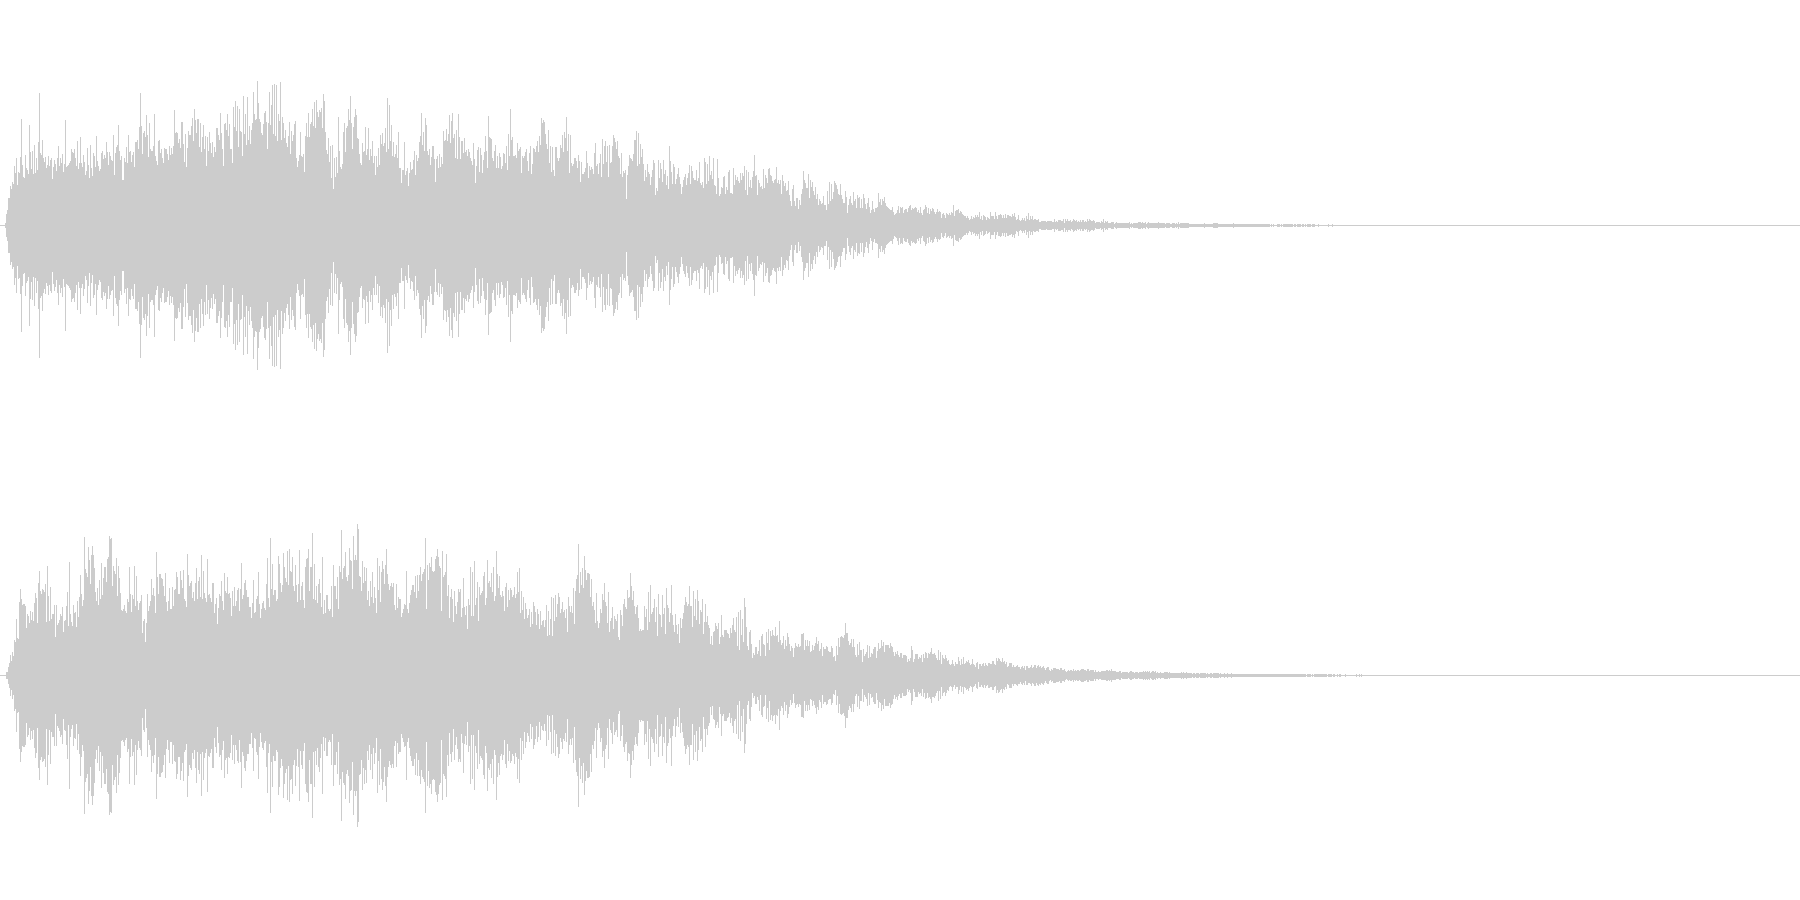 Dark_Attack-23の未再生の波形